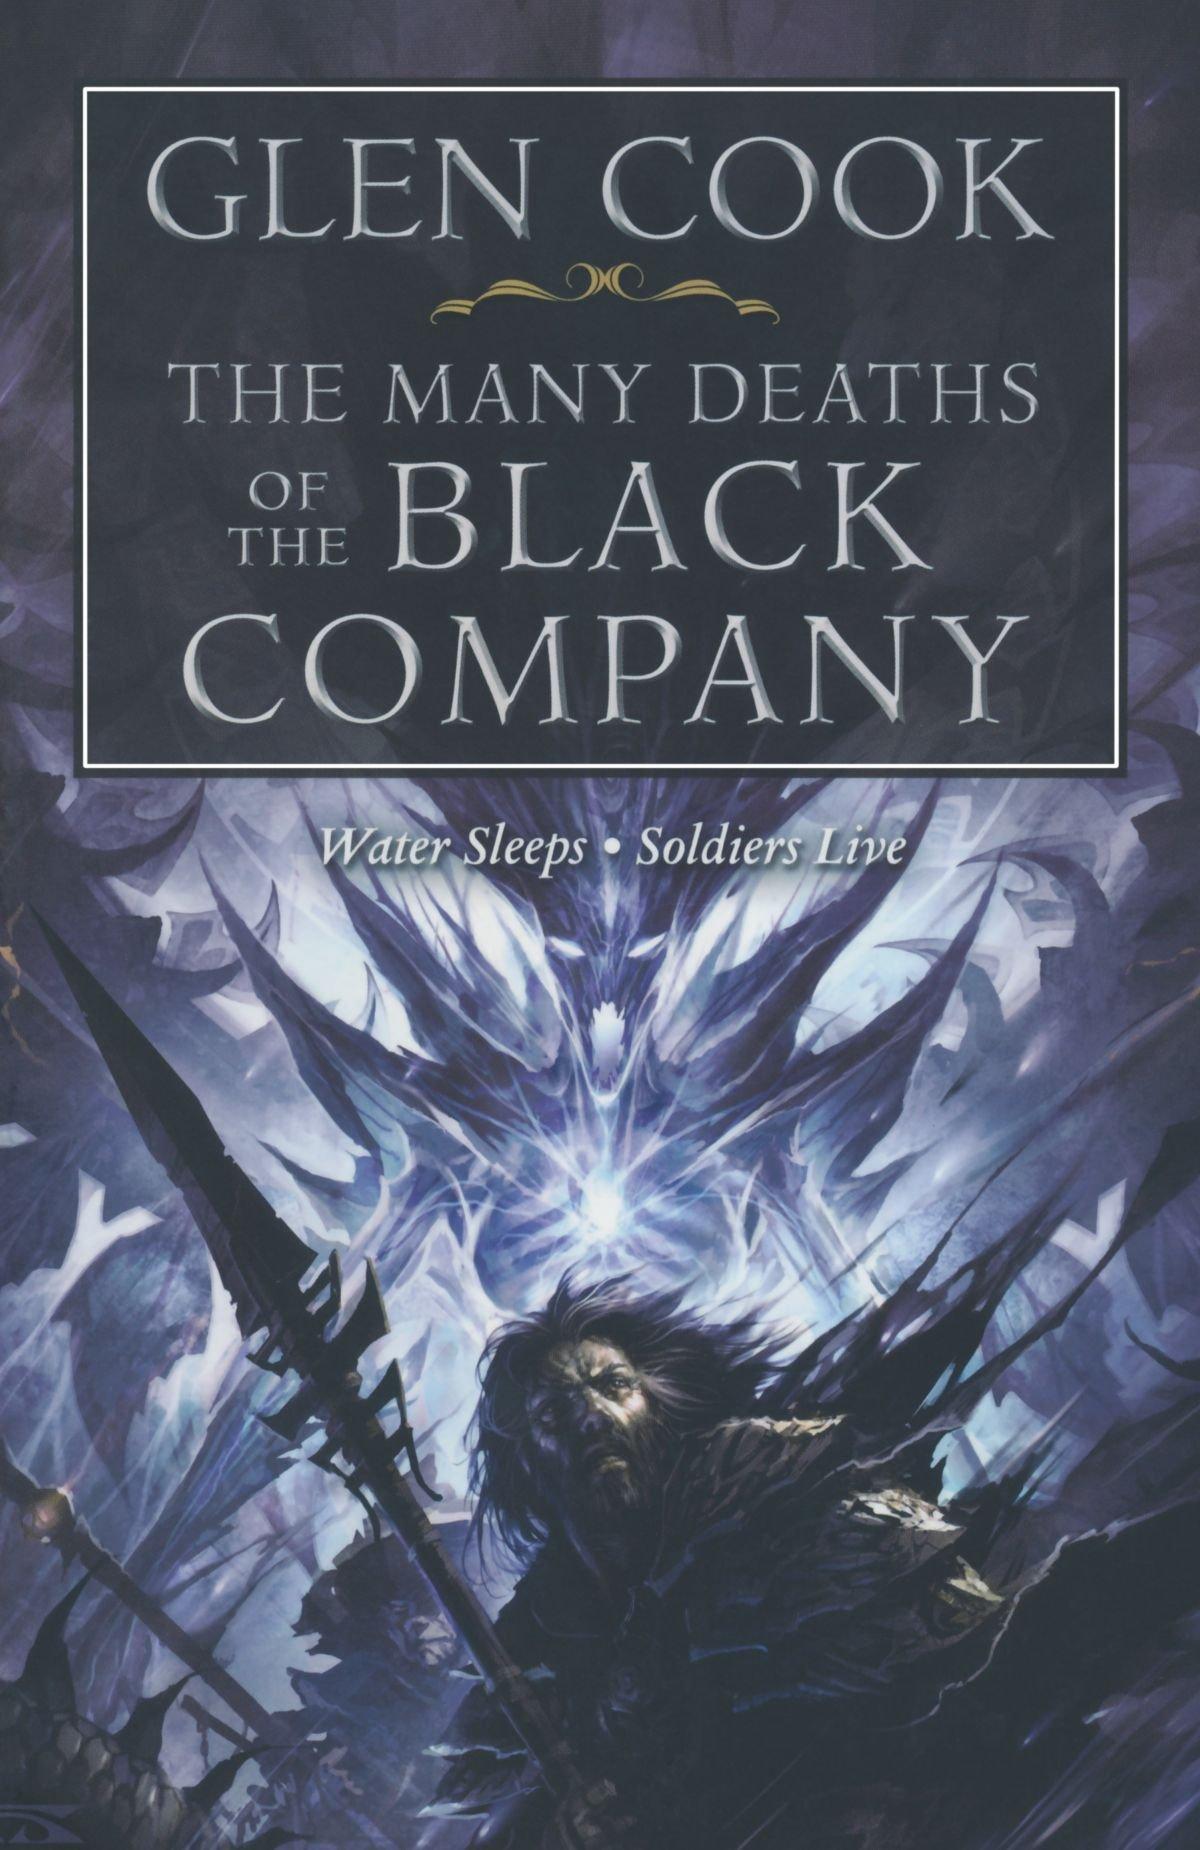 the black company cook glen